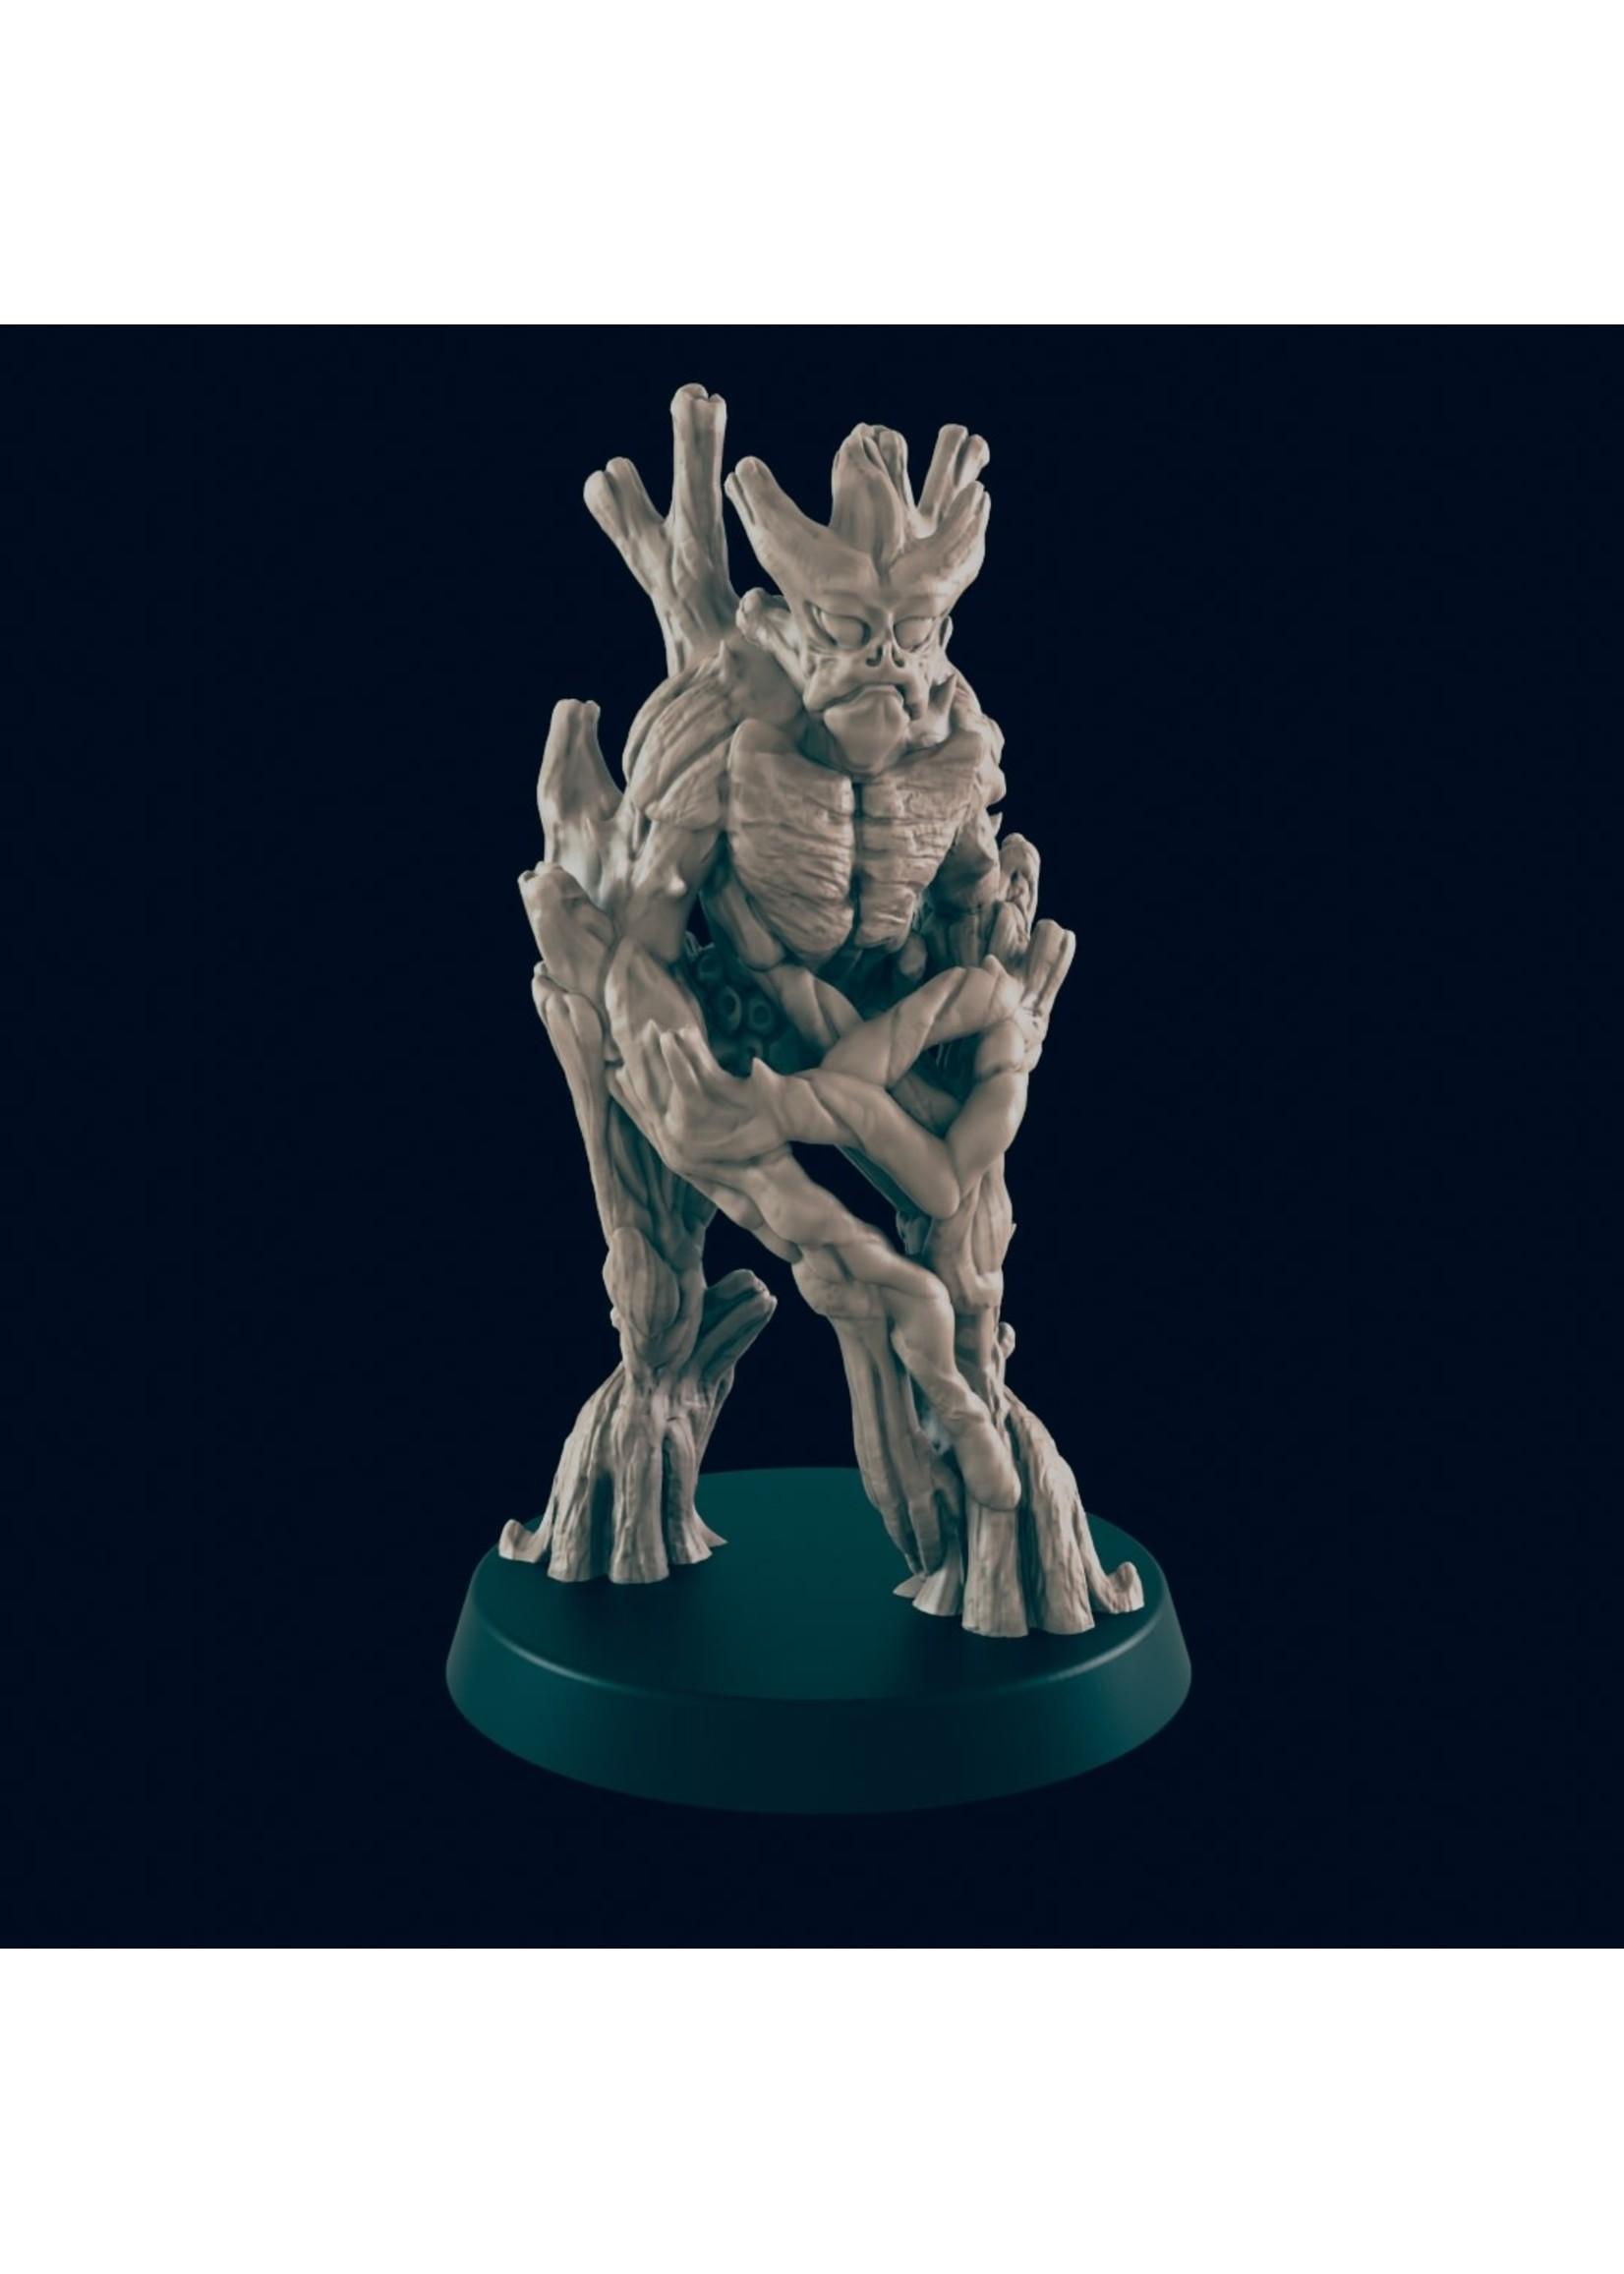 3D Printed Miniature - Tree Blight - Dungeons & Dragons - Beasts and Baddies KS